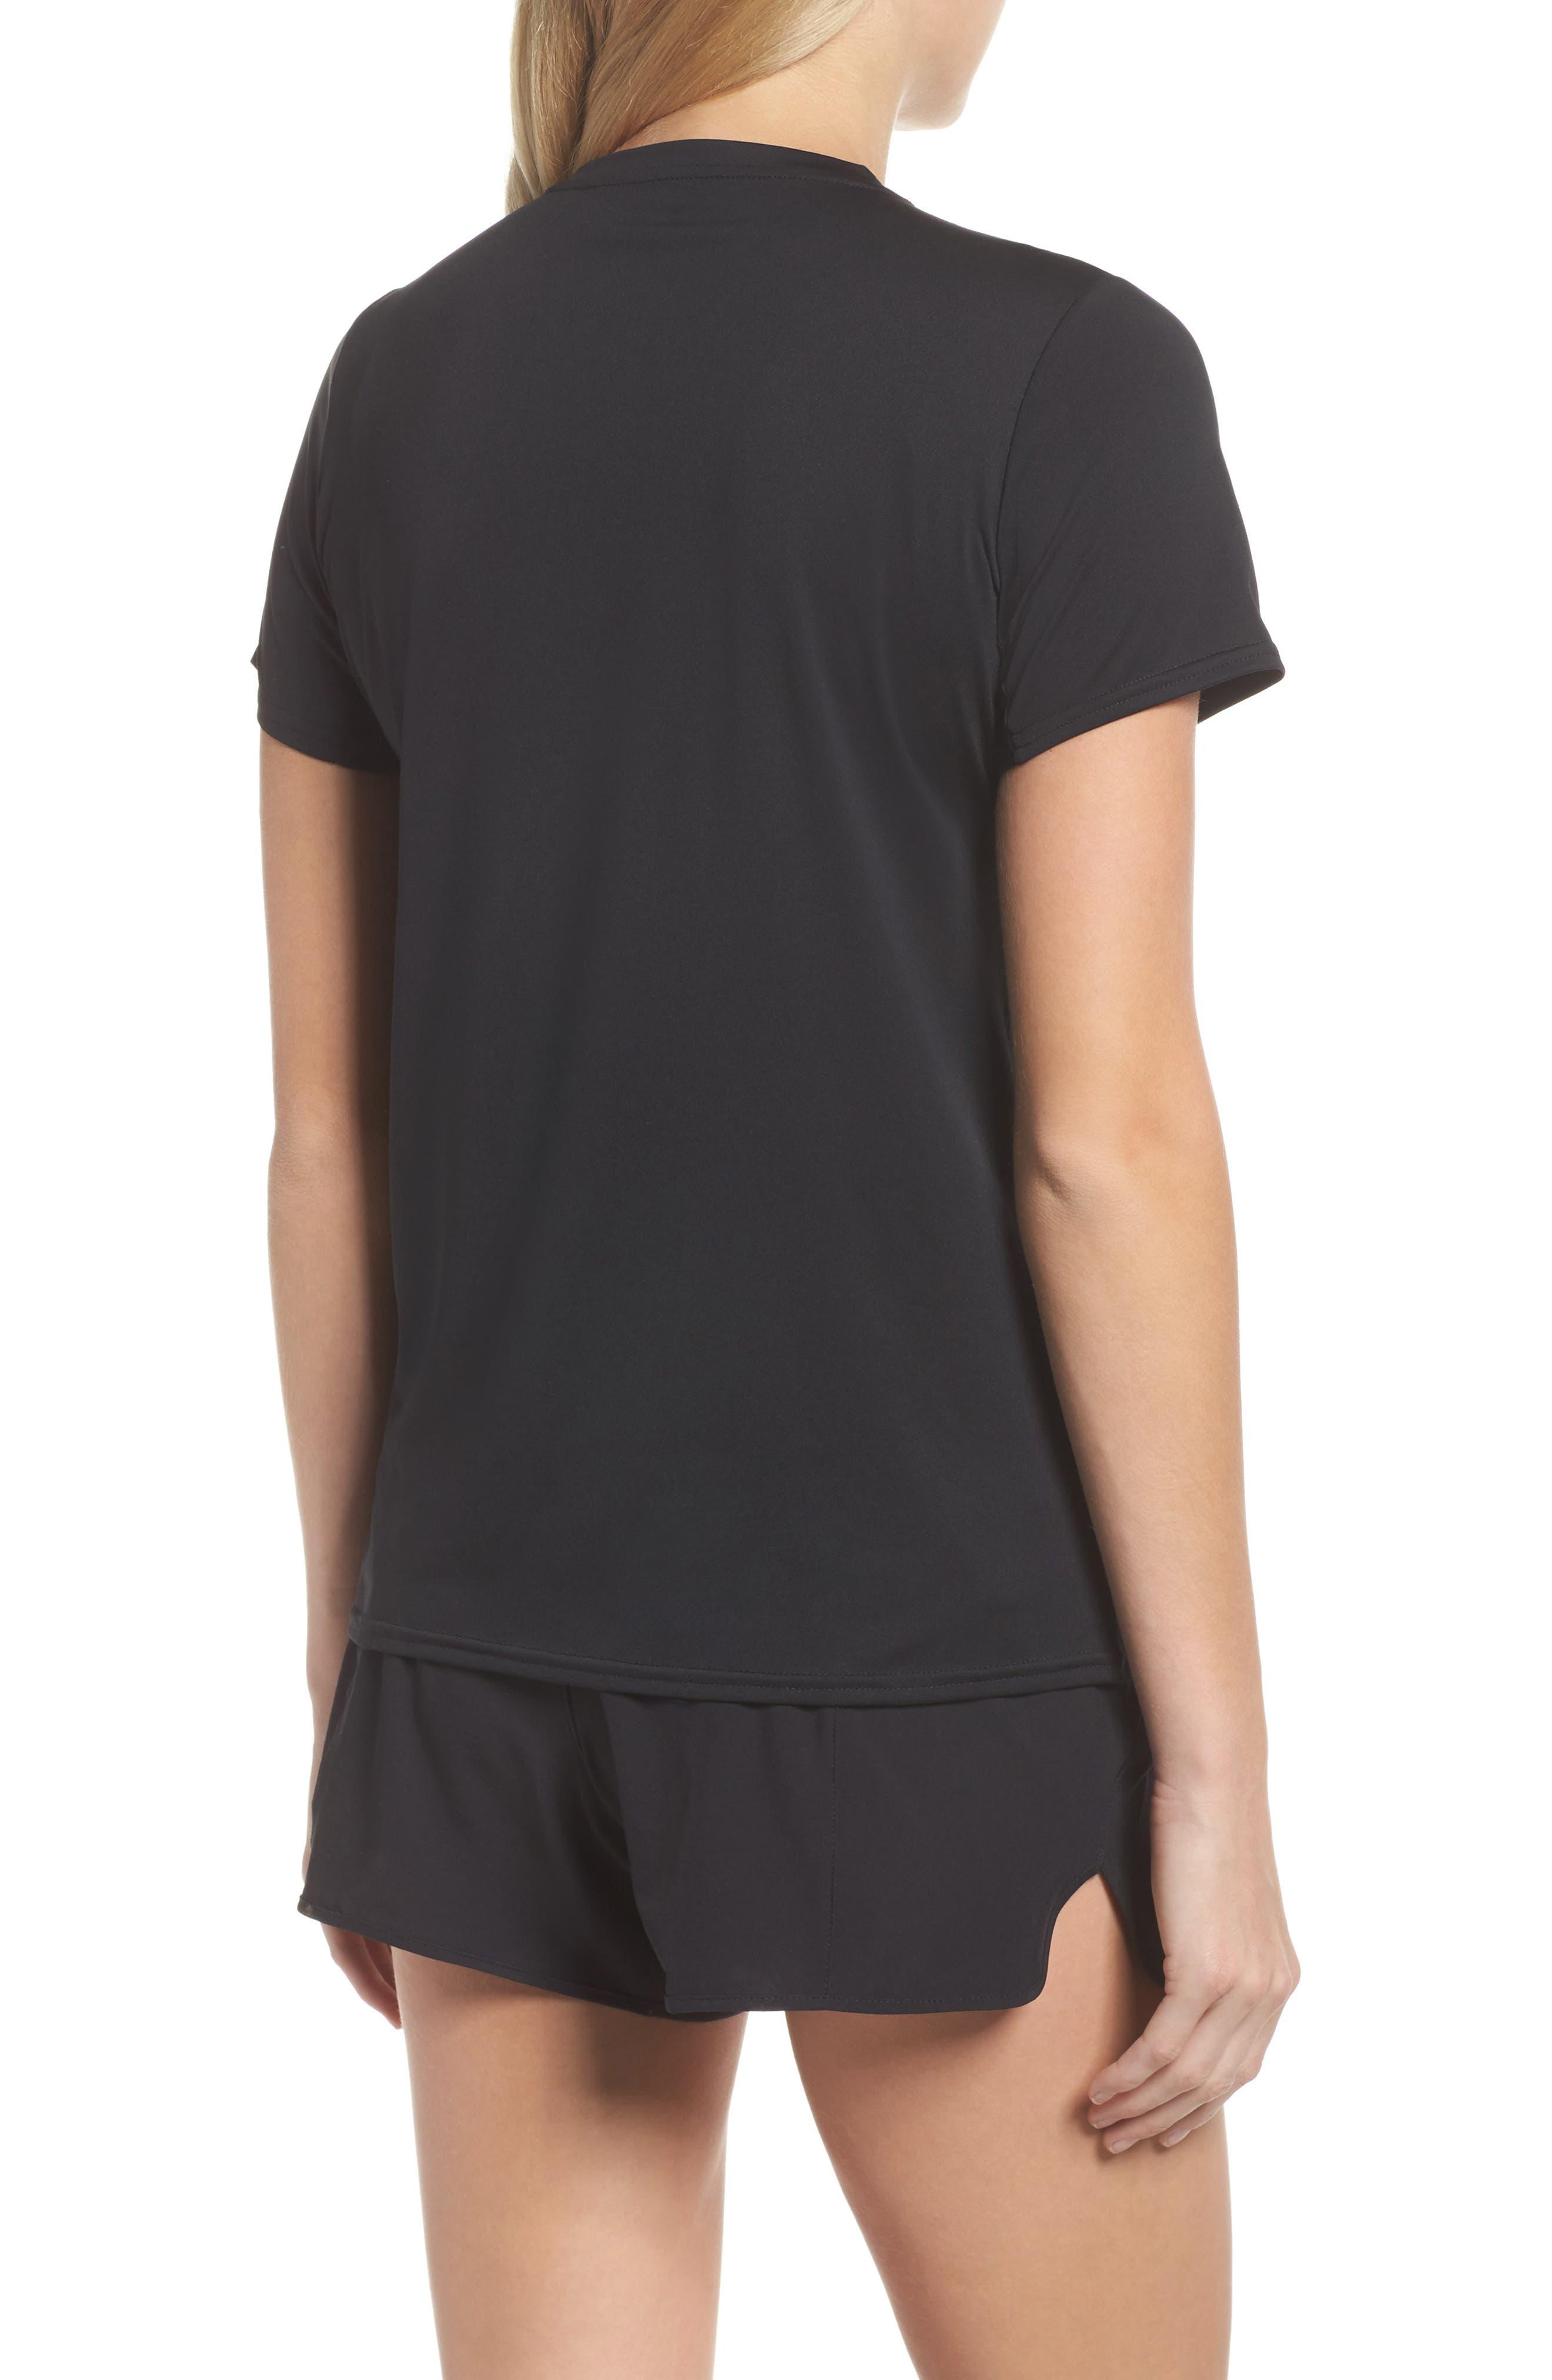 Capilene<sup>®</sup> Dailty T-Shirt,                             Alternate thumbnail 2, color,                             001